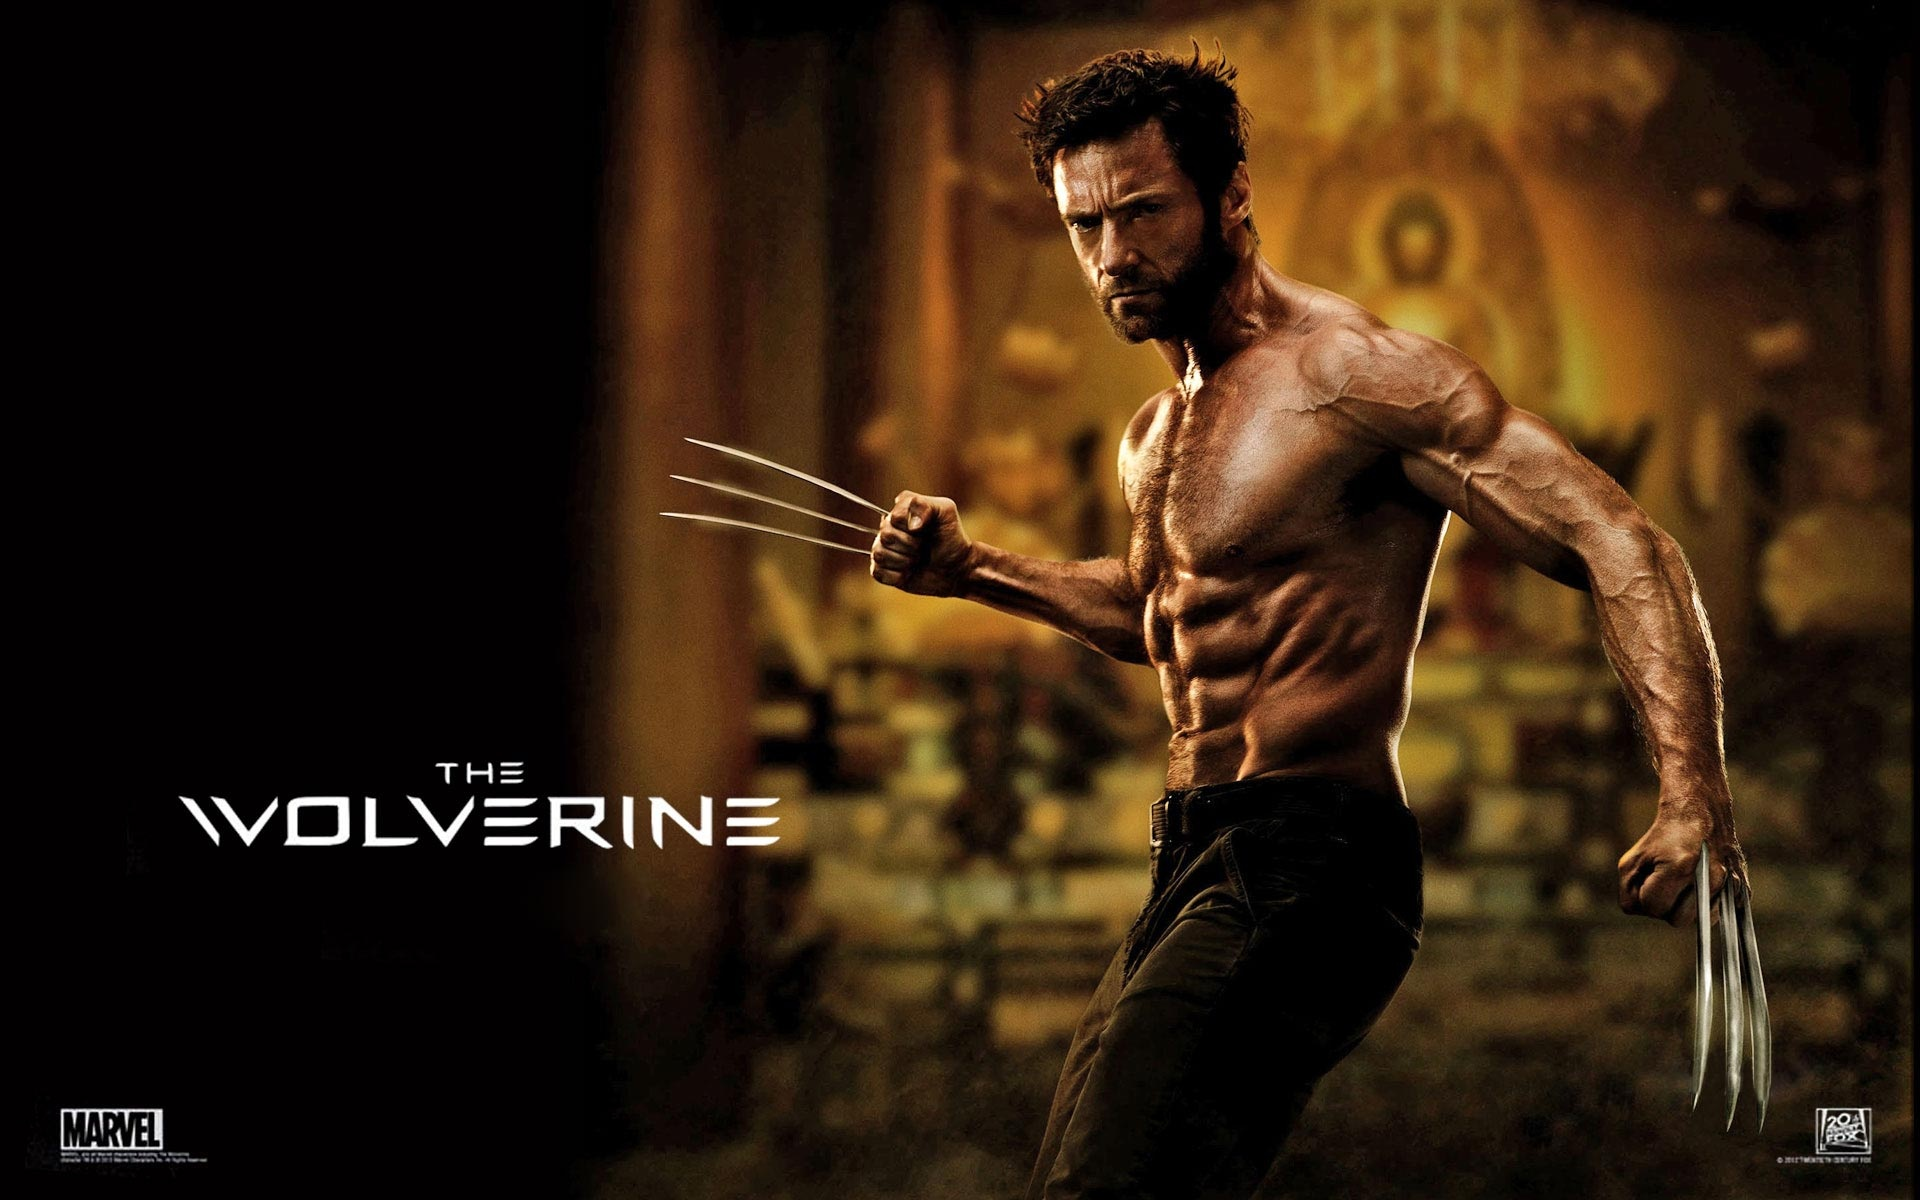 x-men origins wolverine full movie free